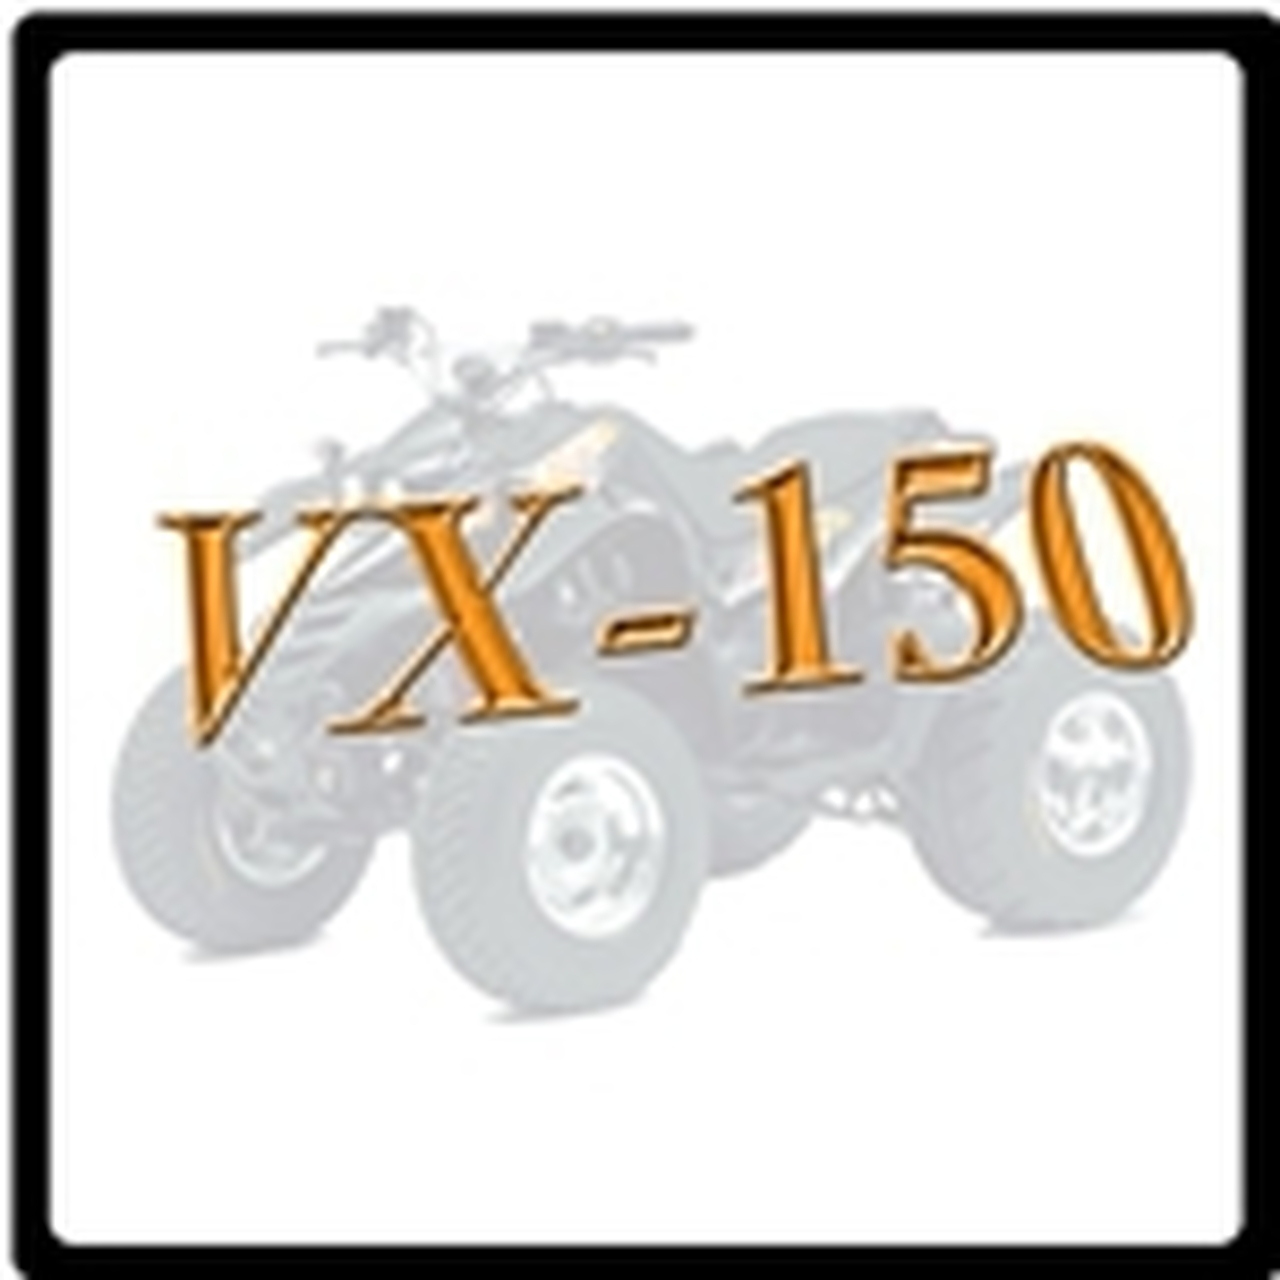 VX-150